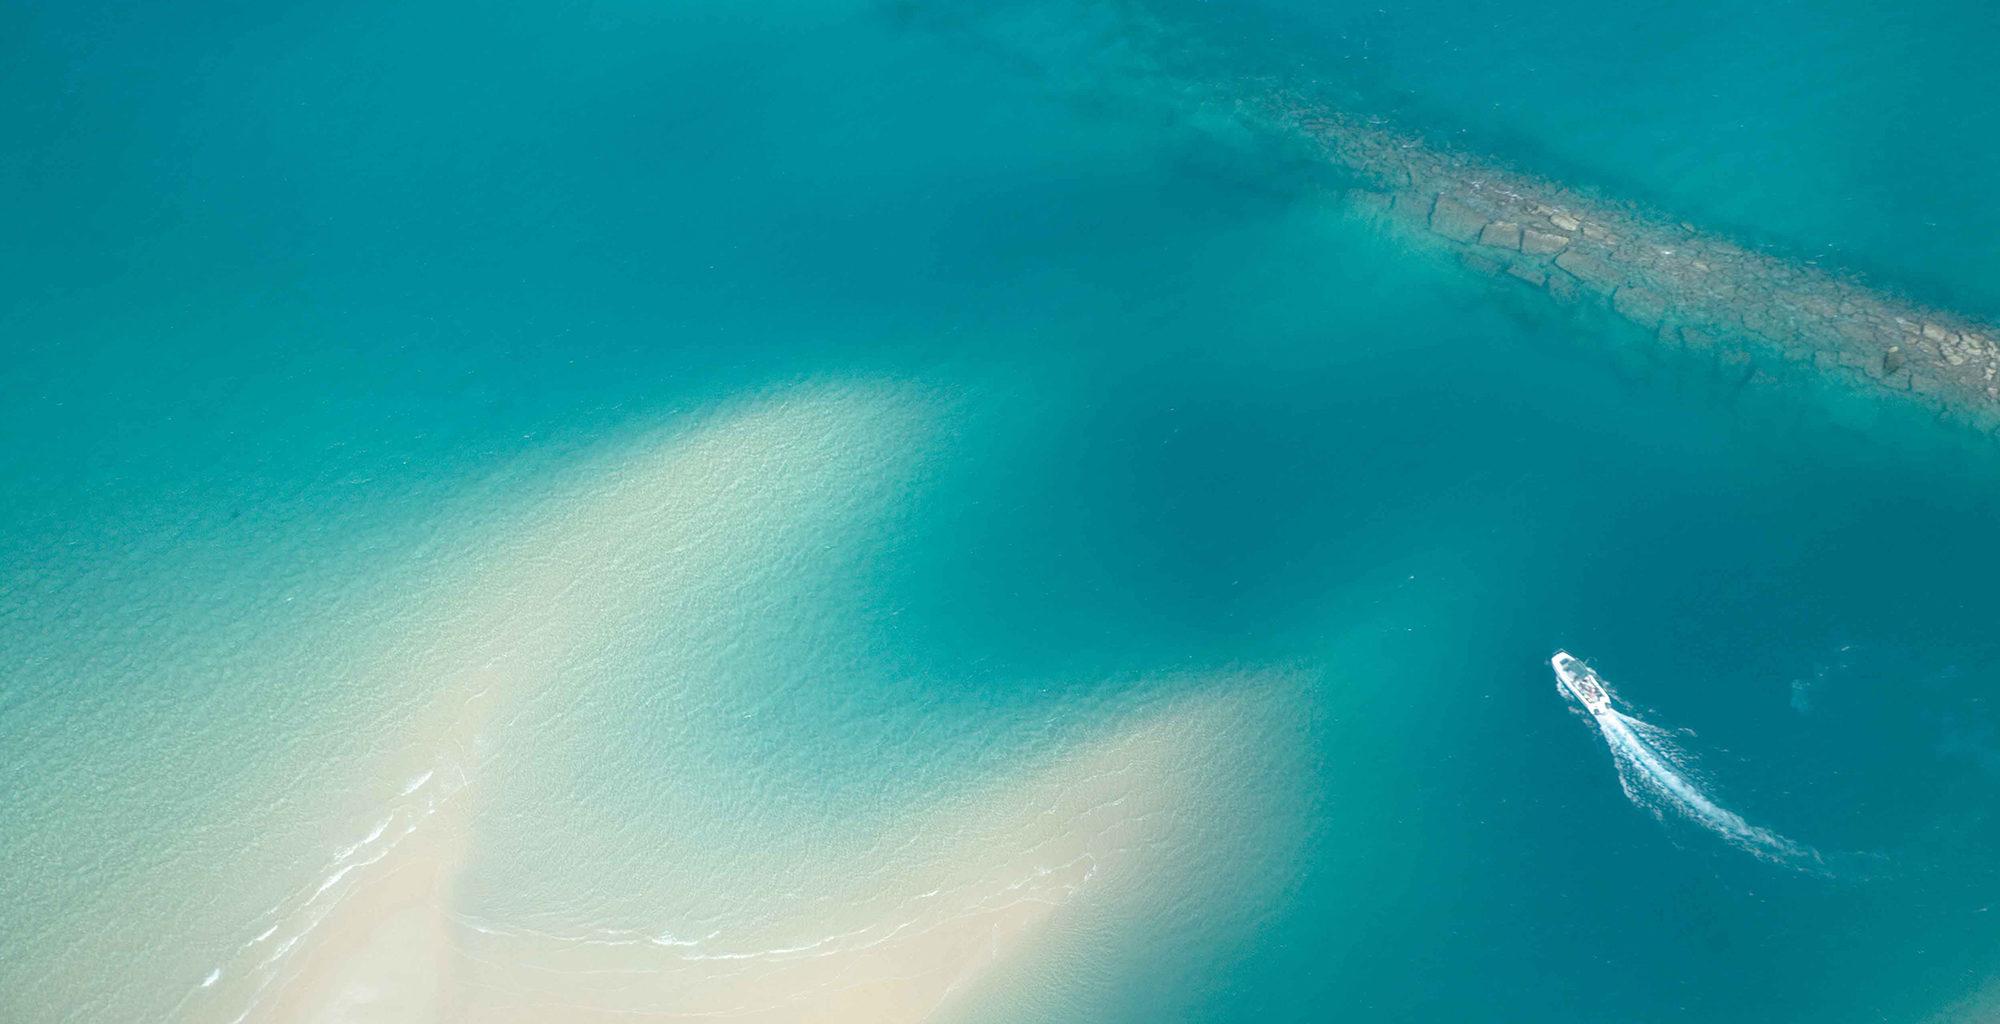 Mozambique-Bazaruto-Archipelago-Aerial